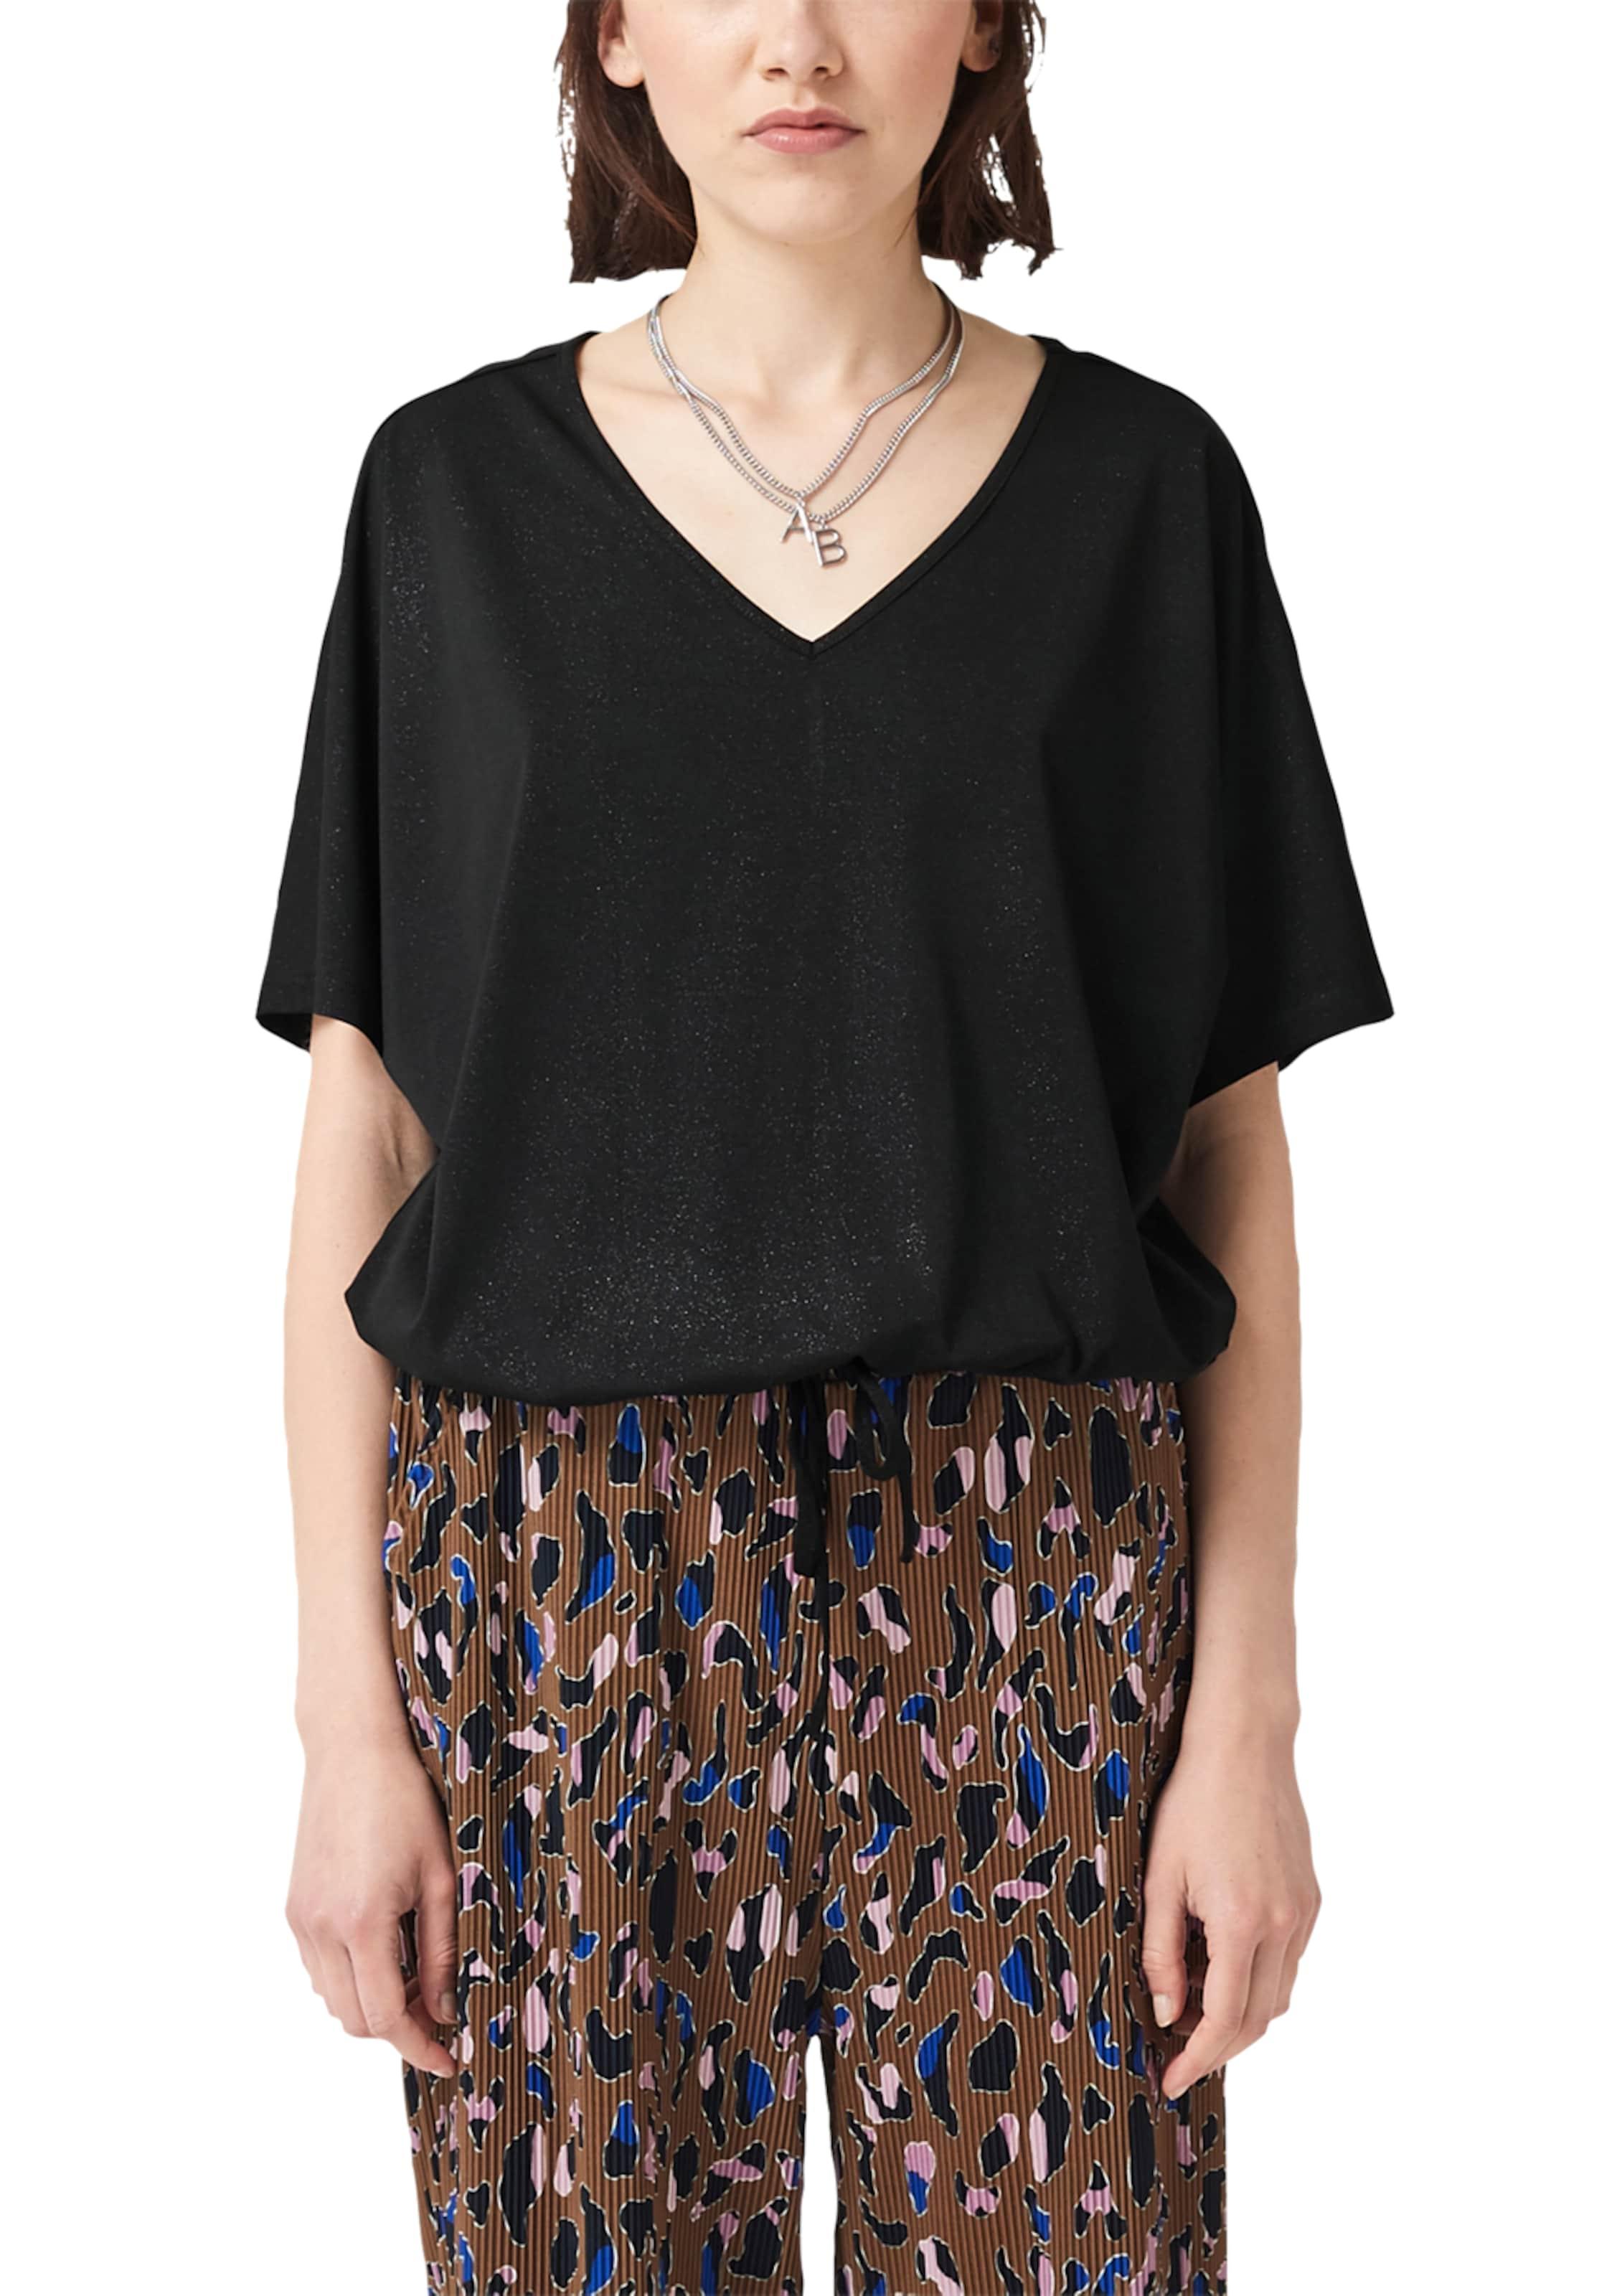 By Designed Q shape Cropped s shirt In O Schwarz USMVzp